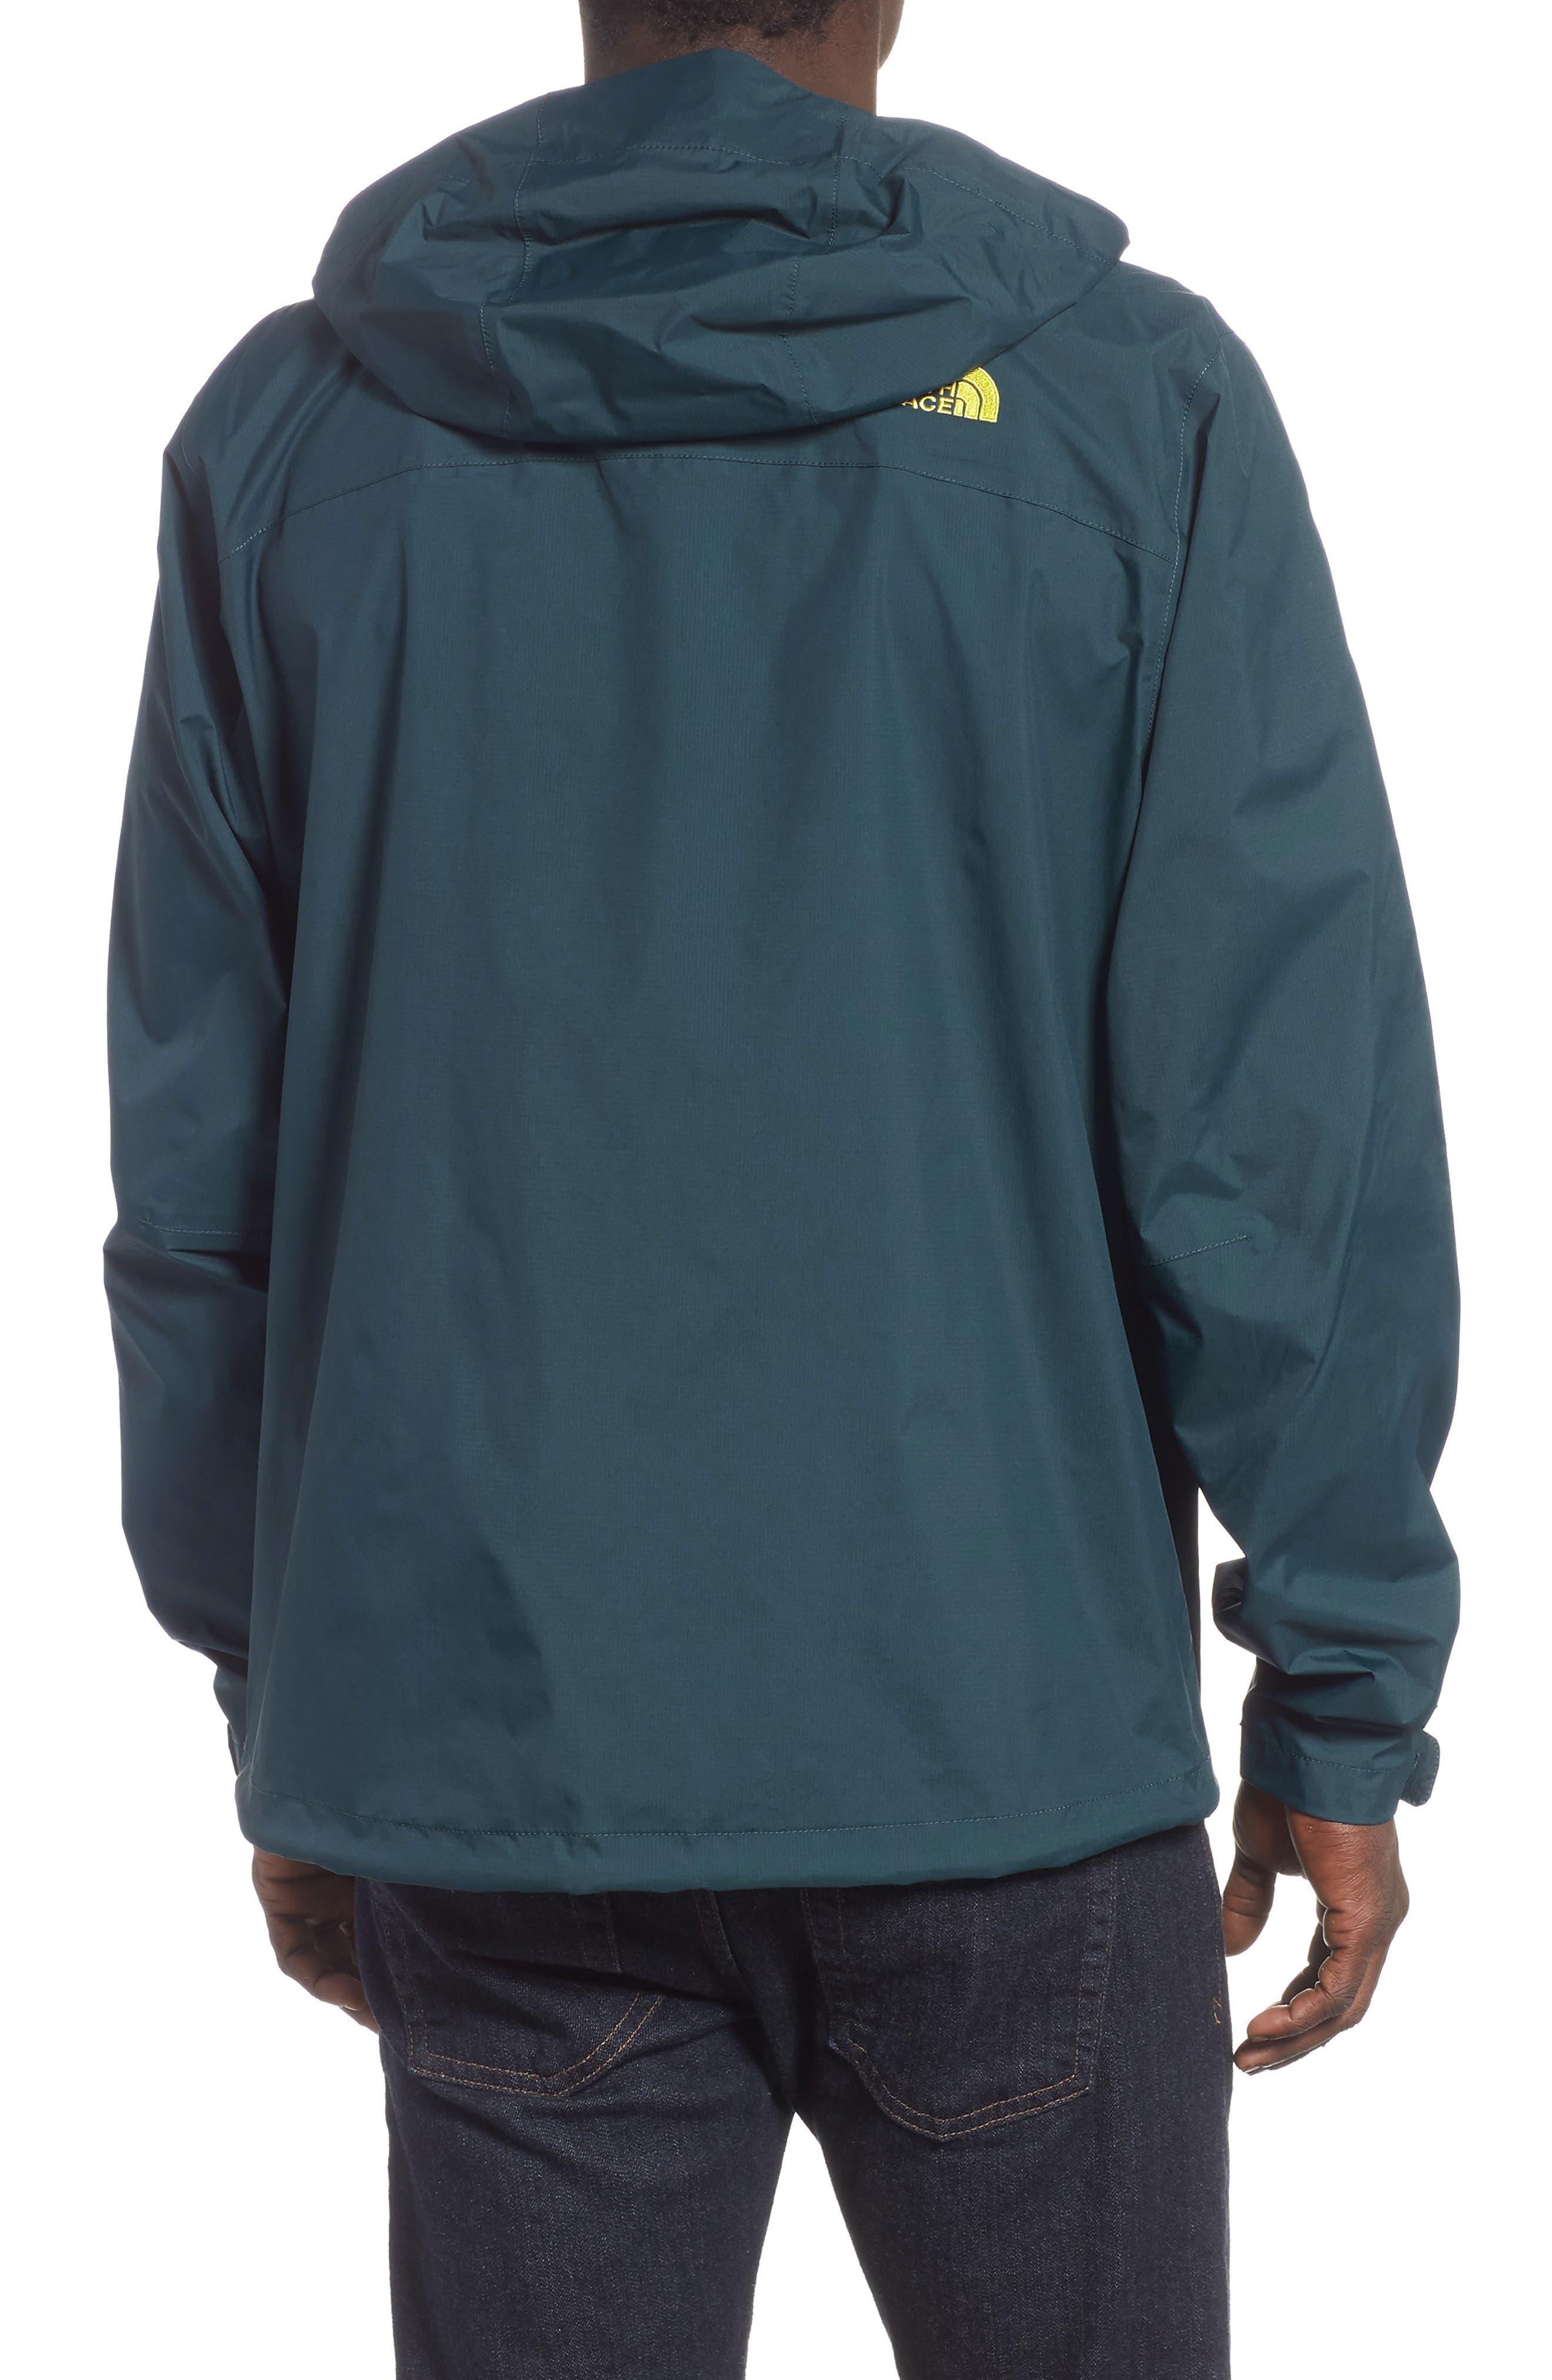 THE NORTH FACE,                             Venture II Raincoat,                             Alternate thumbnail 2, color,                             KODIAK BLUE/ KODIAK BLUE